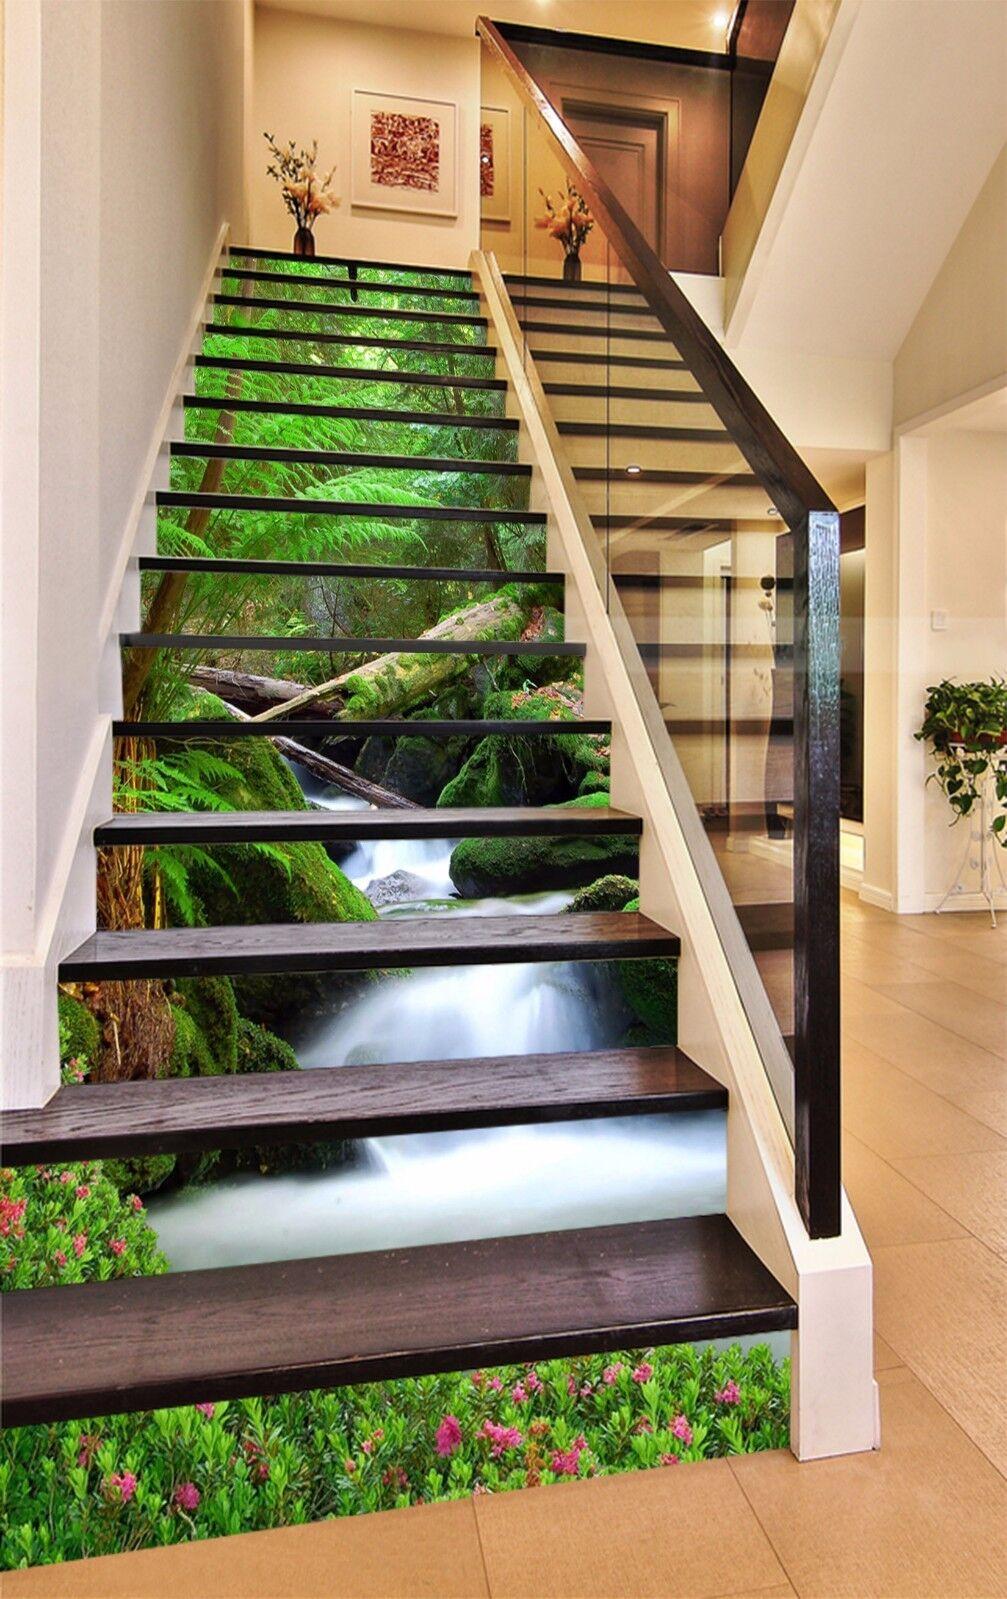 3D Sault Tree 634 Stair Risers Decoration Photo Mural Vinyl Decal Wallpaper UK